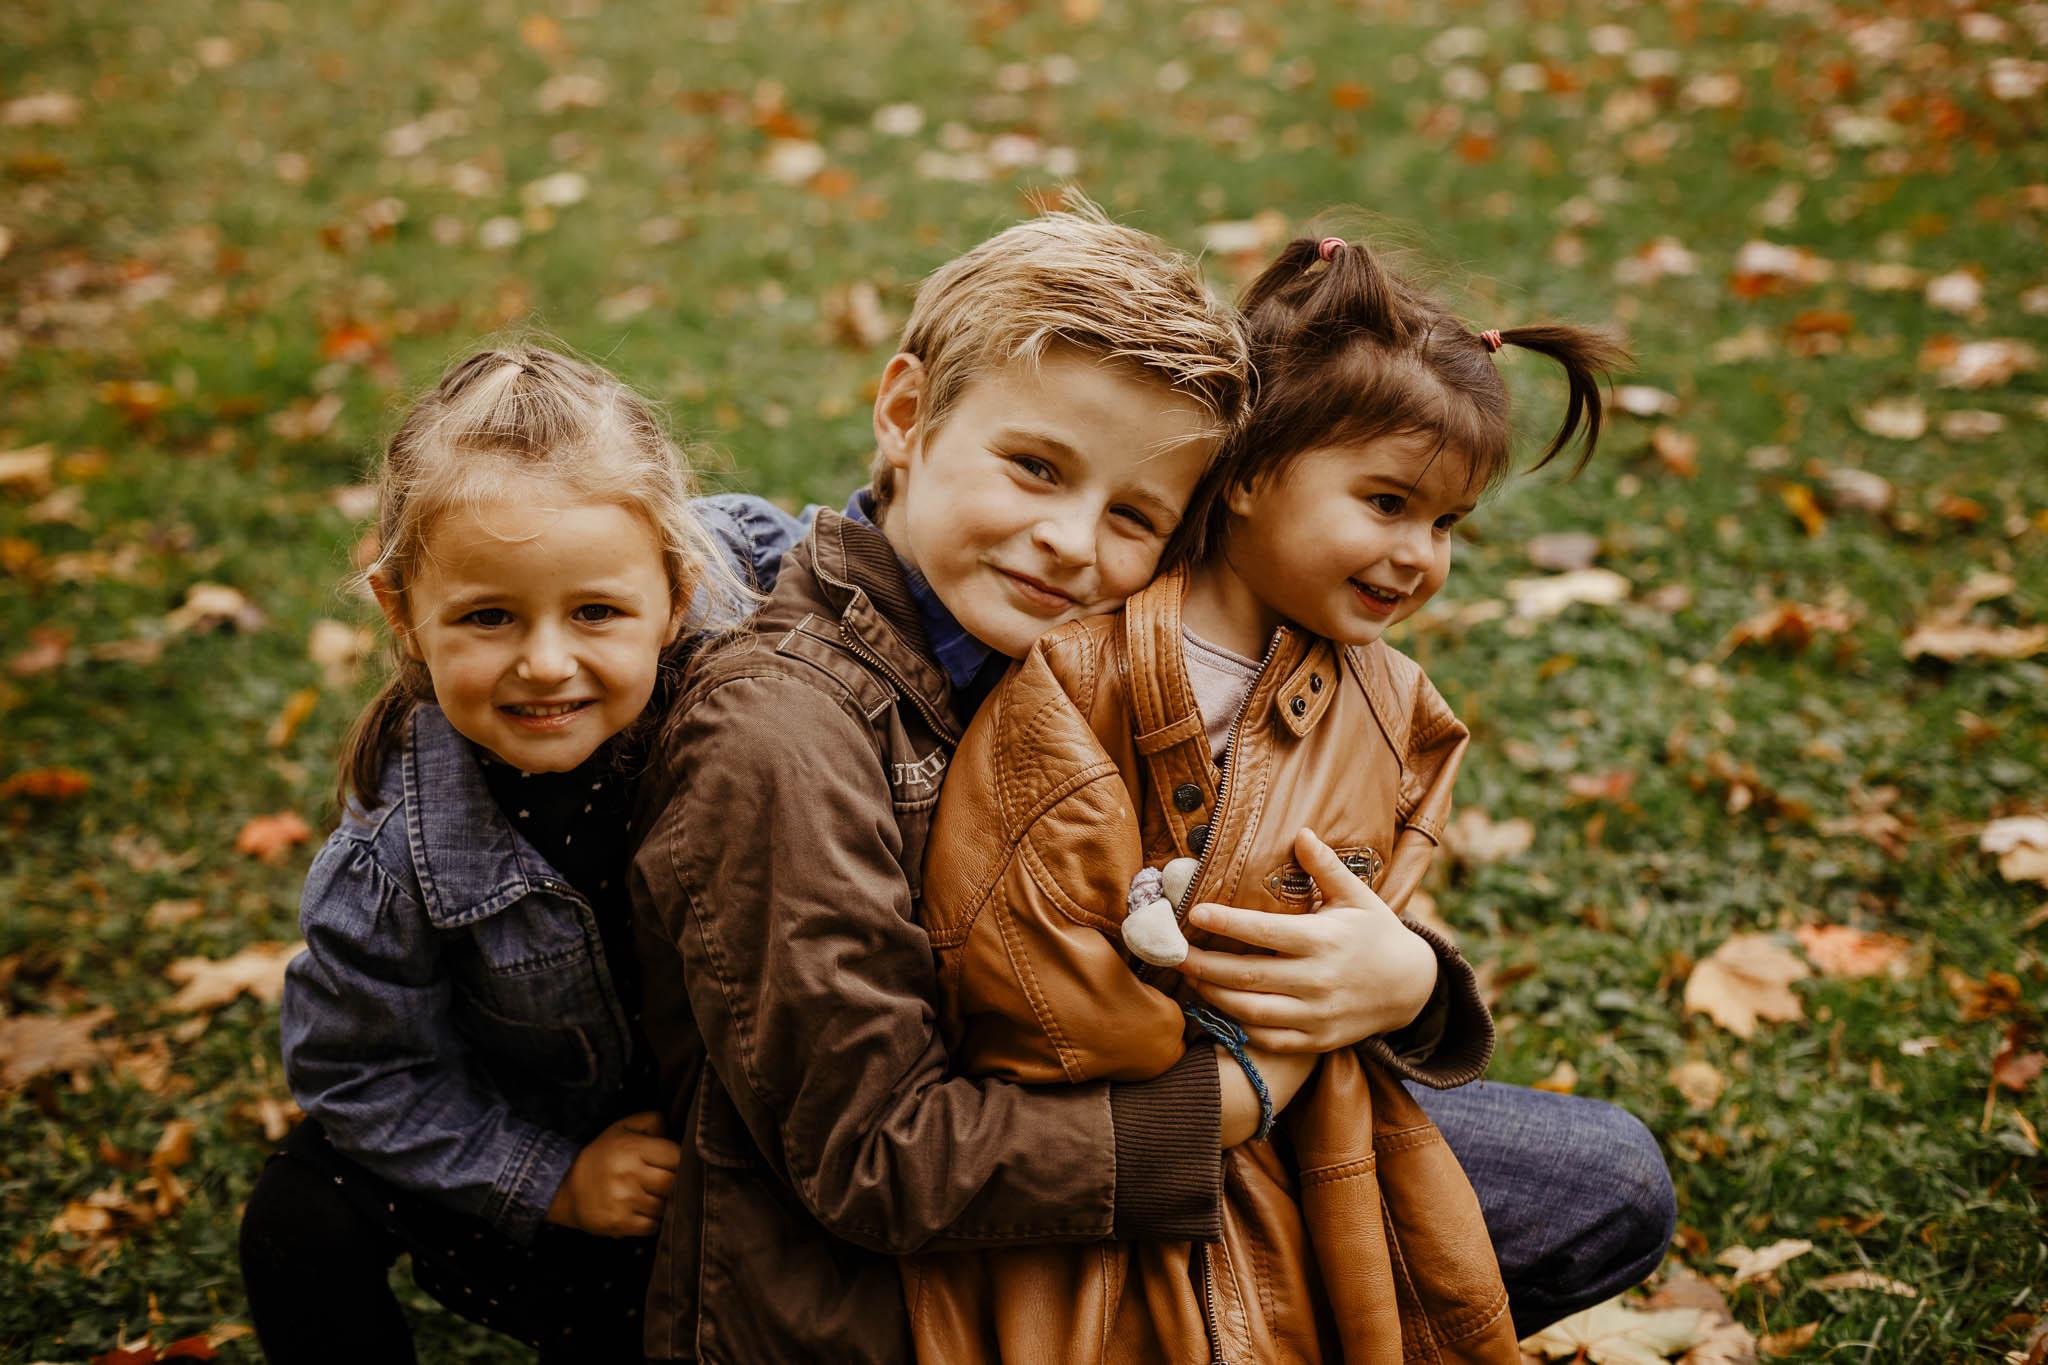 famille-lyon-parc-ingold-15.jpg